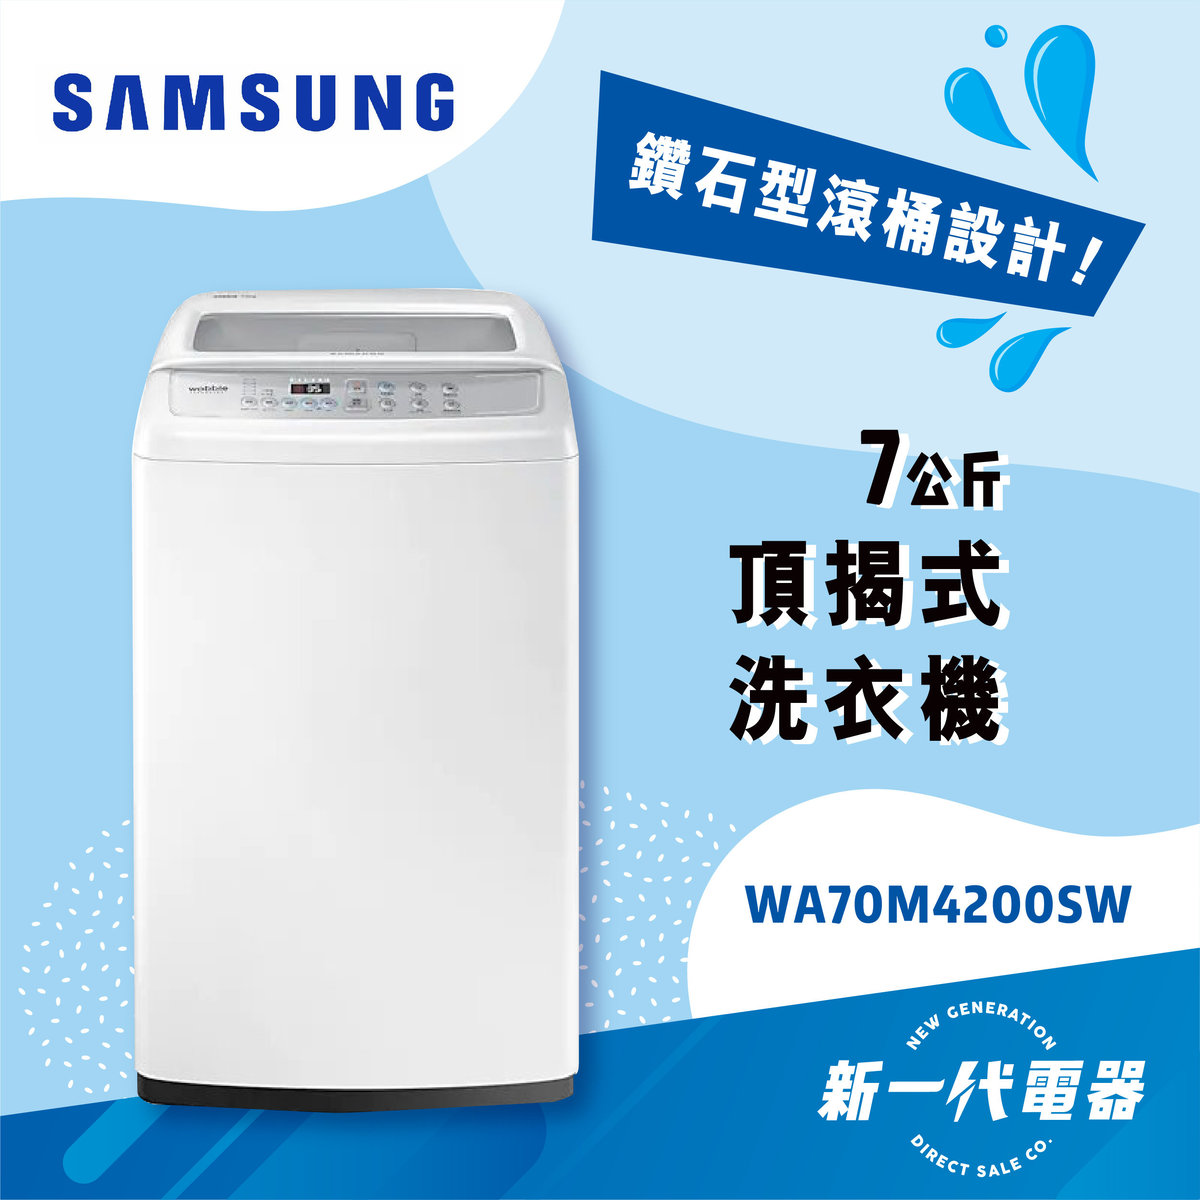 WA70M4200SW Top Loader With Drain Pump 7kg White